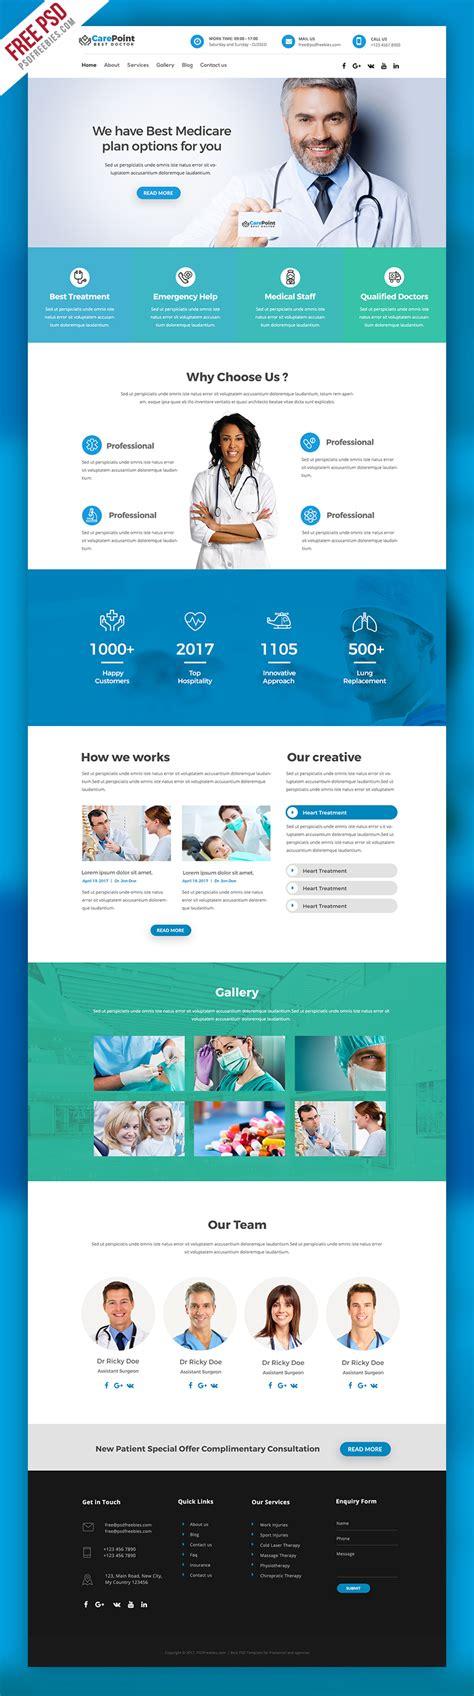 templates for medical website free download medical hospital website psd template psdfreebies com